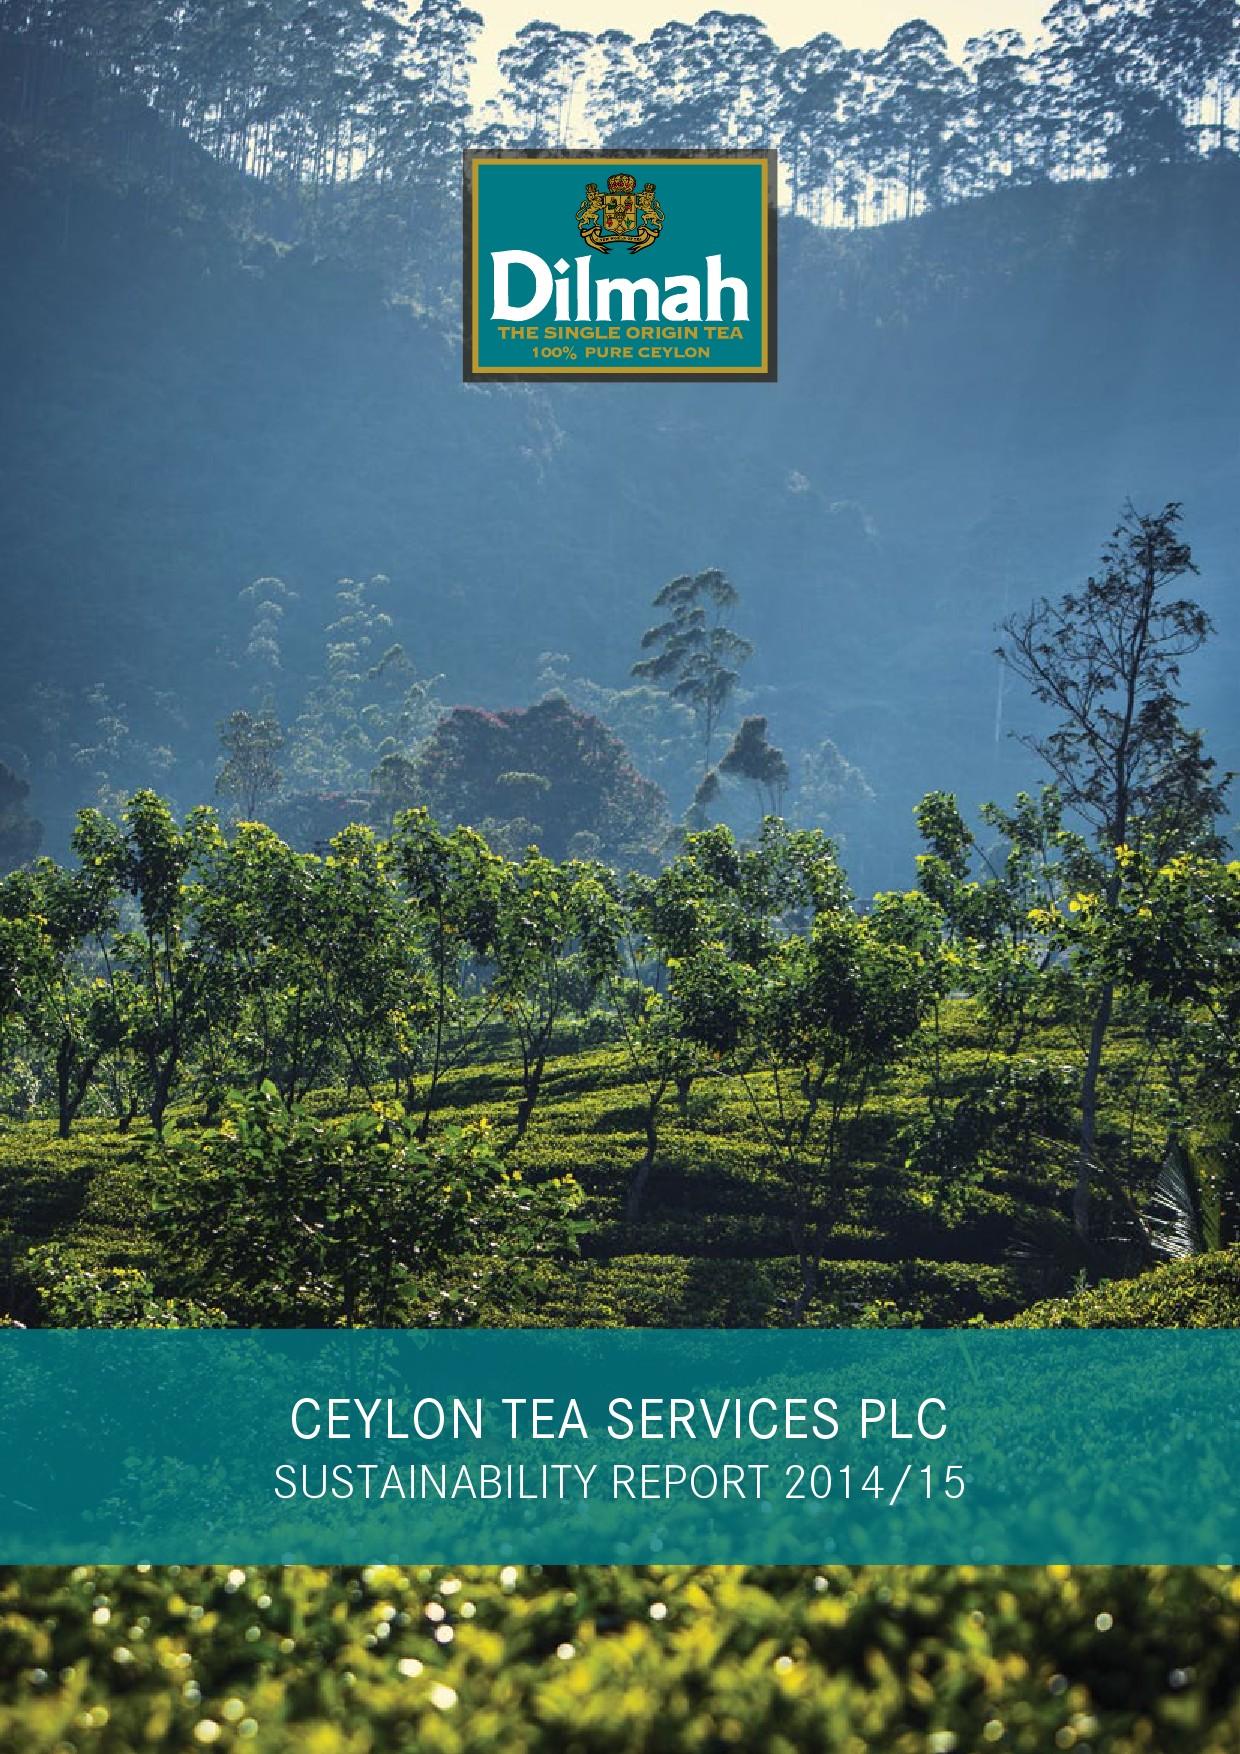 ceylon tea services plc